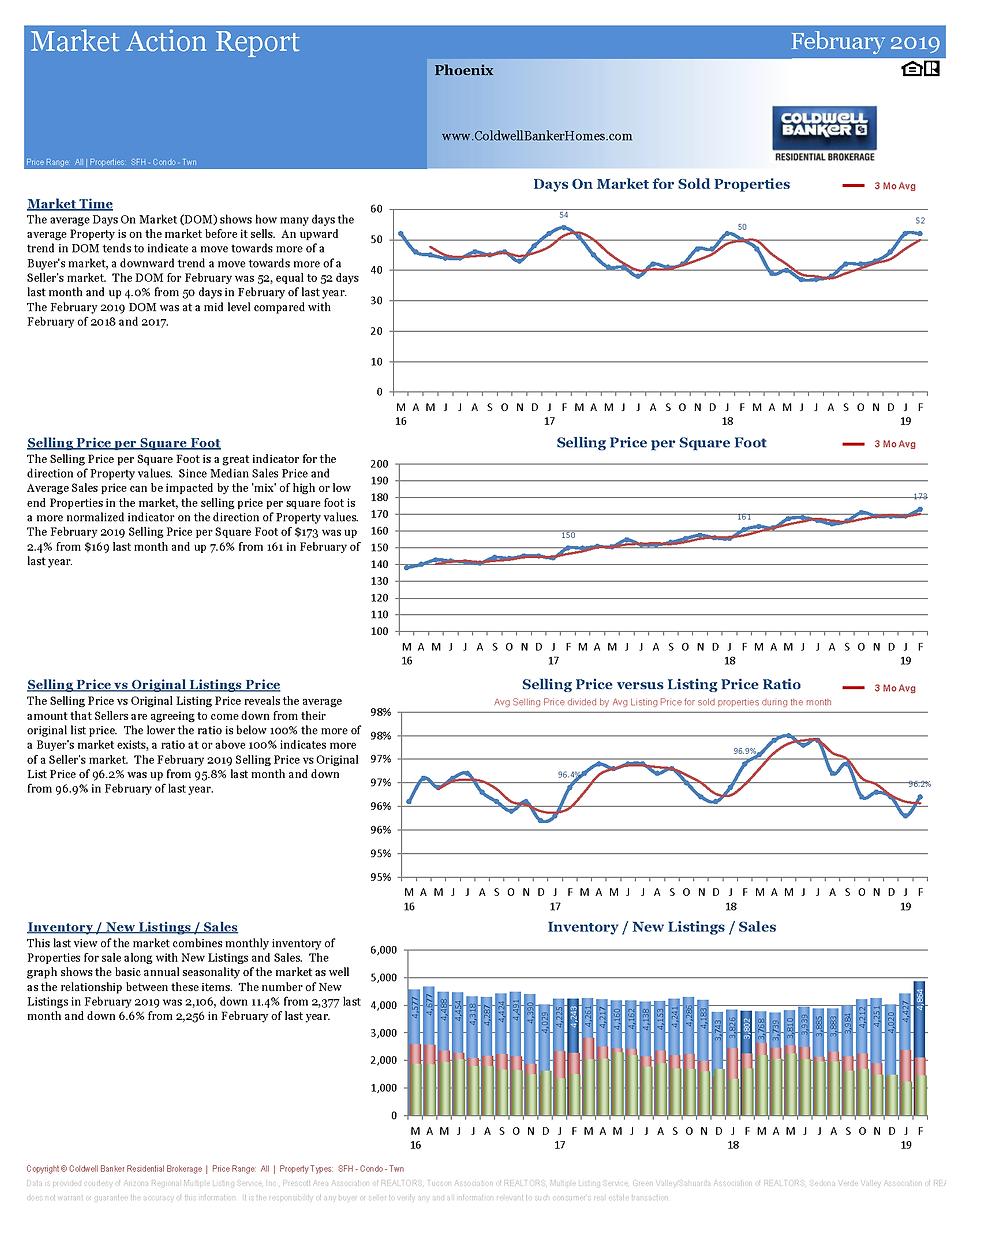 MarketActionReportPhoenix_Page_2.png